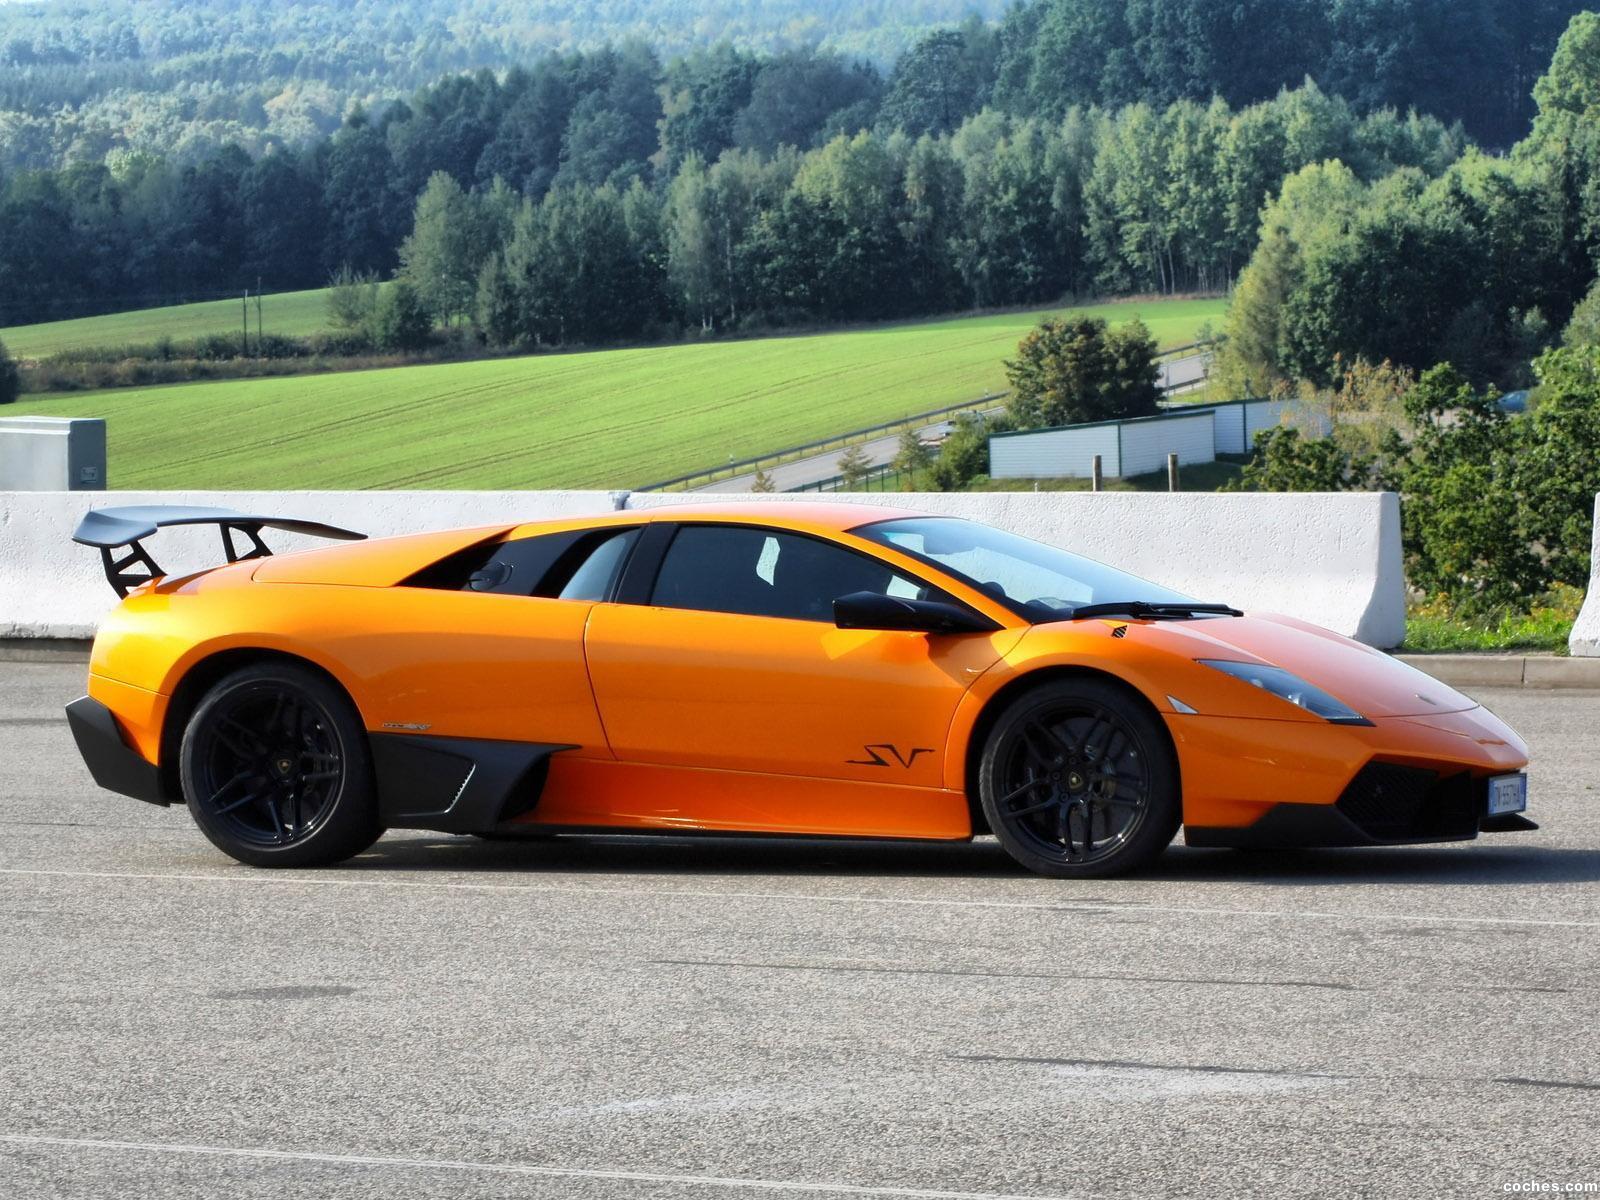 Foto 1 de Lamborghini Murcielago LP670-4 SV Premier4509 2010